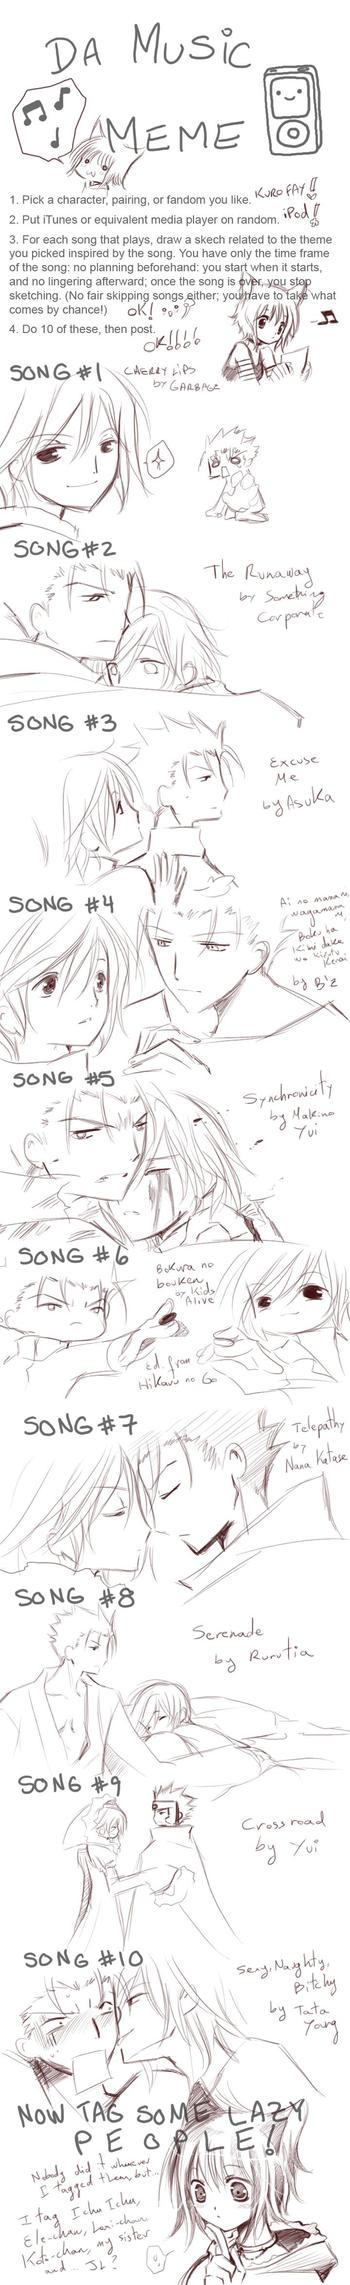 Maeoneechan's Music meme by inma